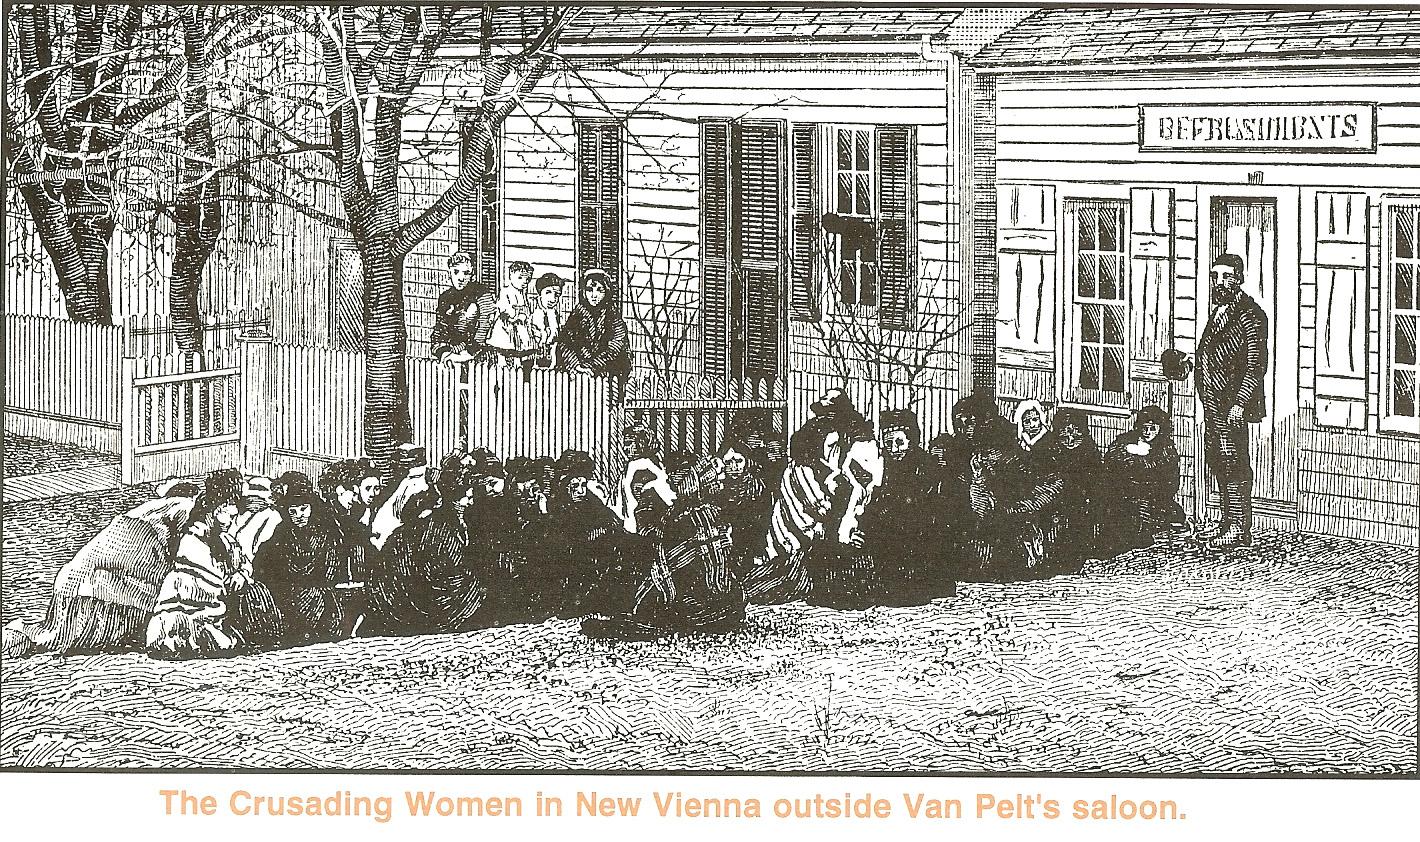 Illustration of woman crusading in New Vienna, Ohio